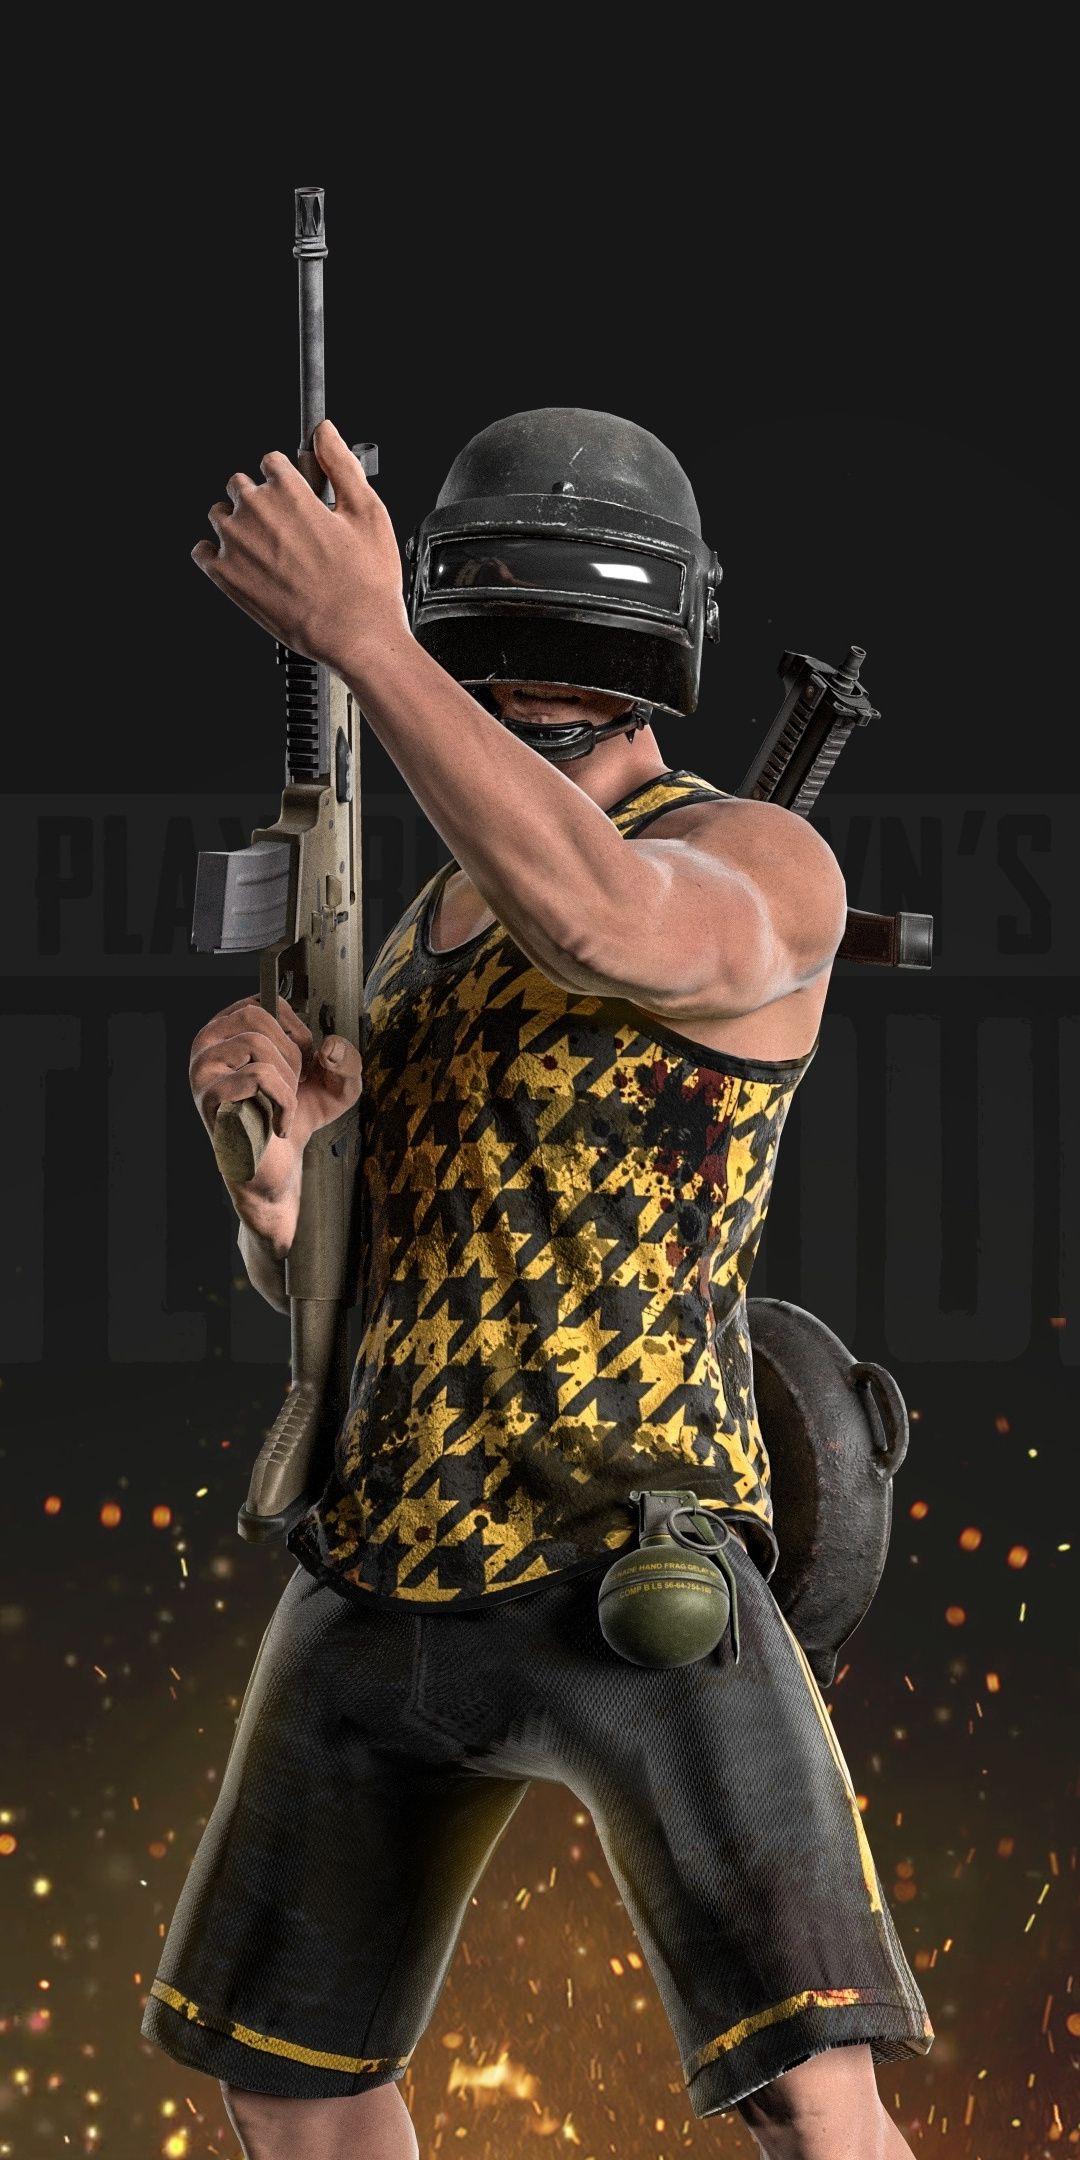 PUBG, video game, helmet guy in shorts, 1080x2160